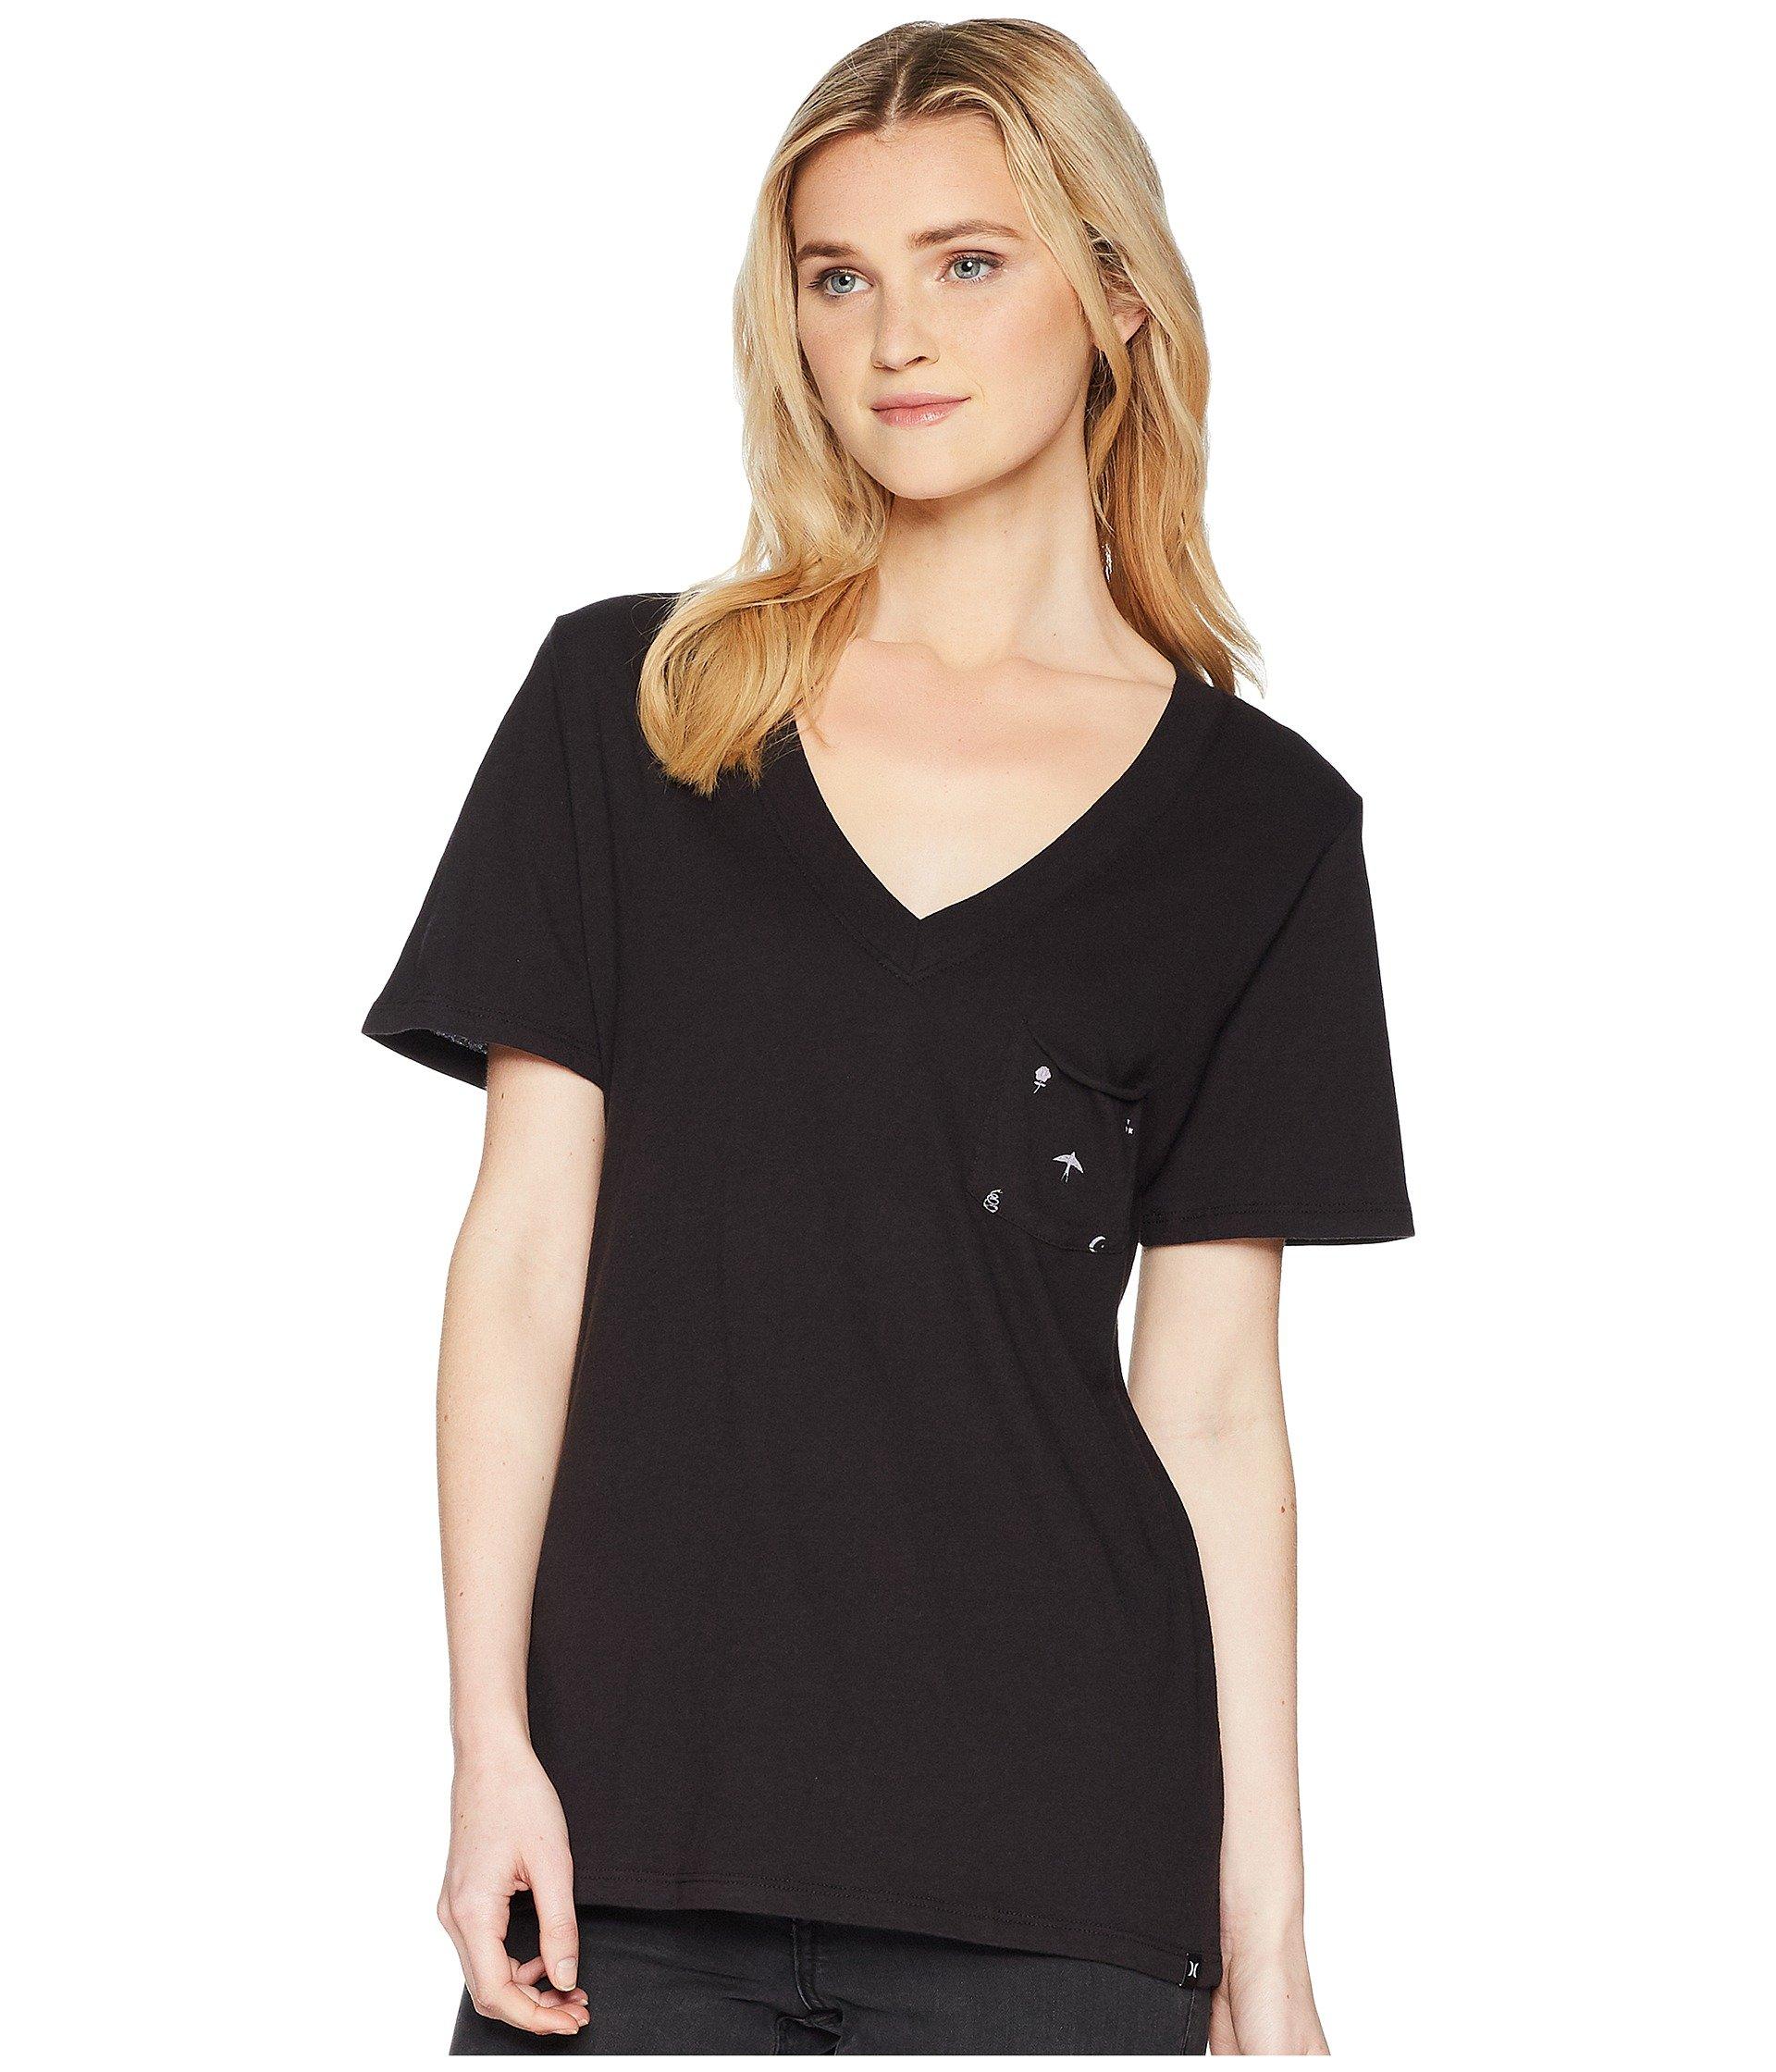 Hurley Women's Hallow Perfect Short Sleeve V Tee Black X-Large